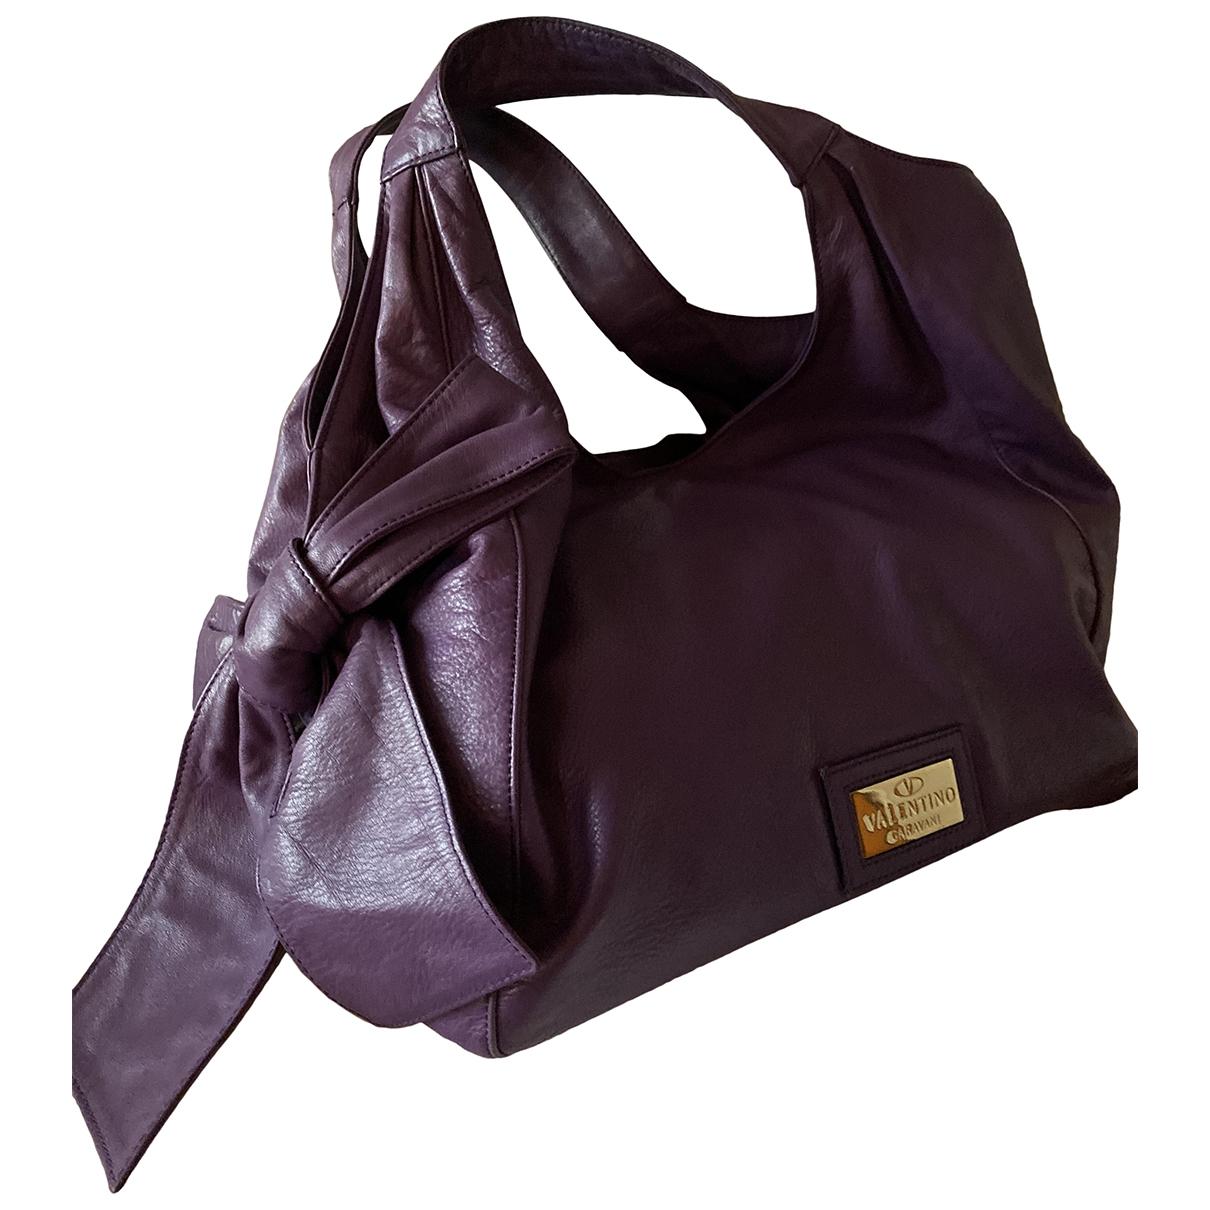 Valentino Garavani \N Purple Leather handbag for Women \N